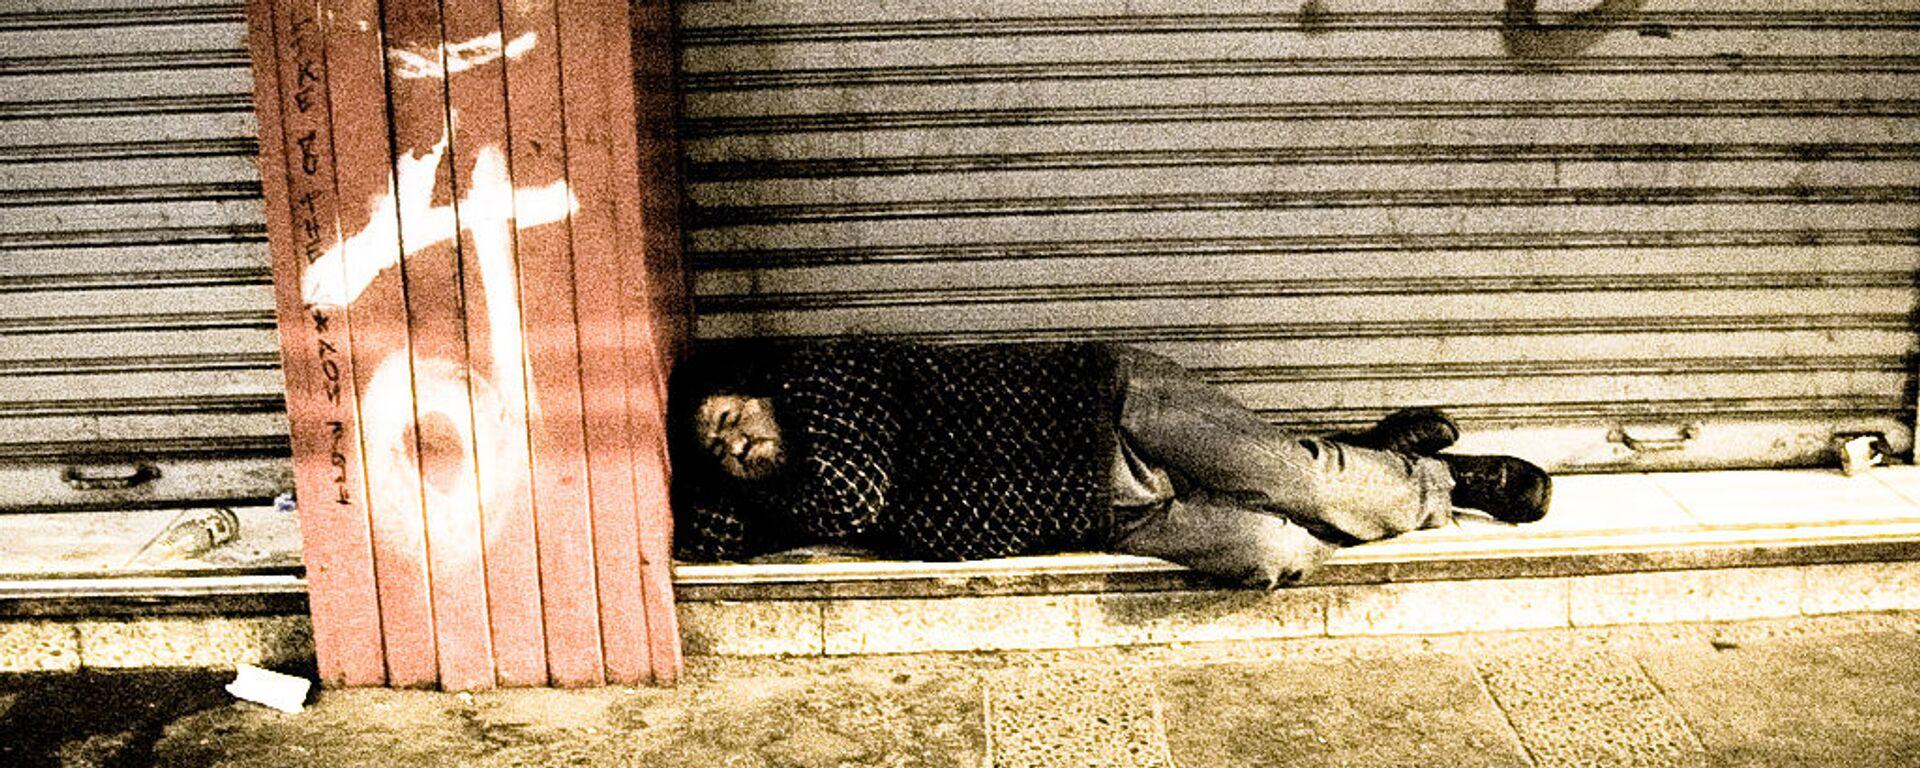 Persona sin hogar - Sputnik Mundo, 1920, 26.04.2021